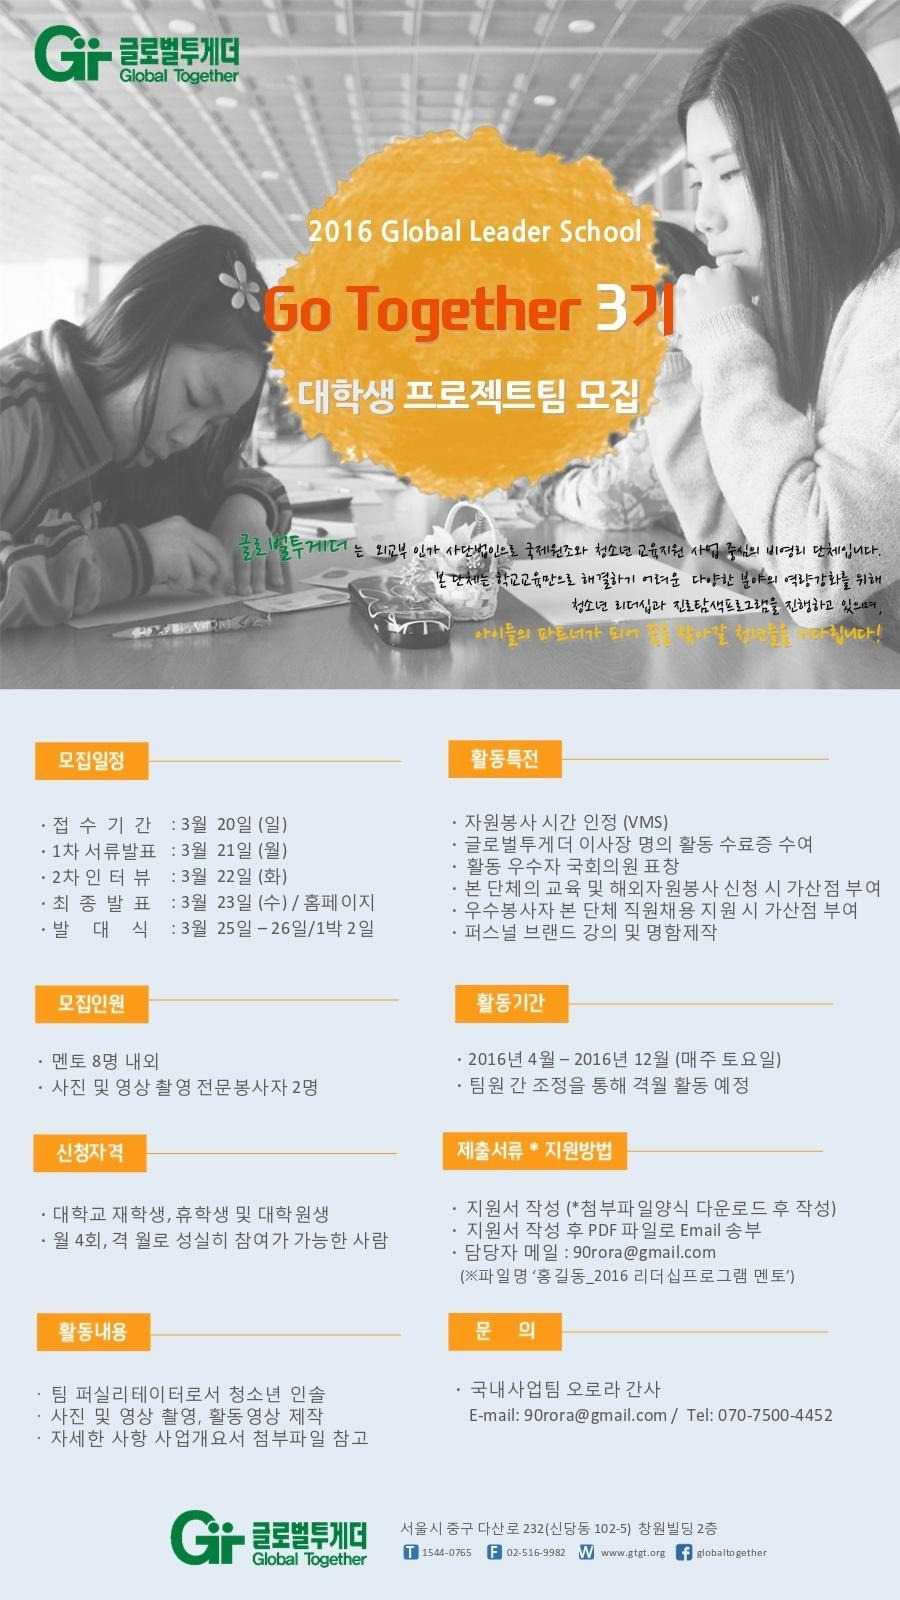 [NGO글로벌투게더] 2016 Global Leader School 대학생프로젝트팀 3기 모집